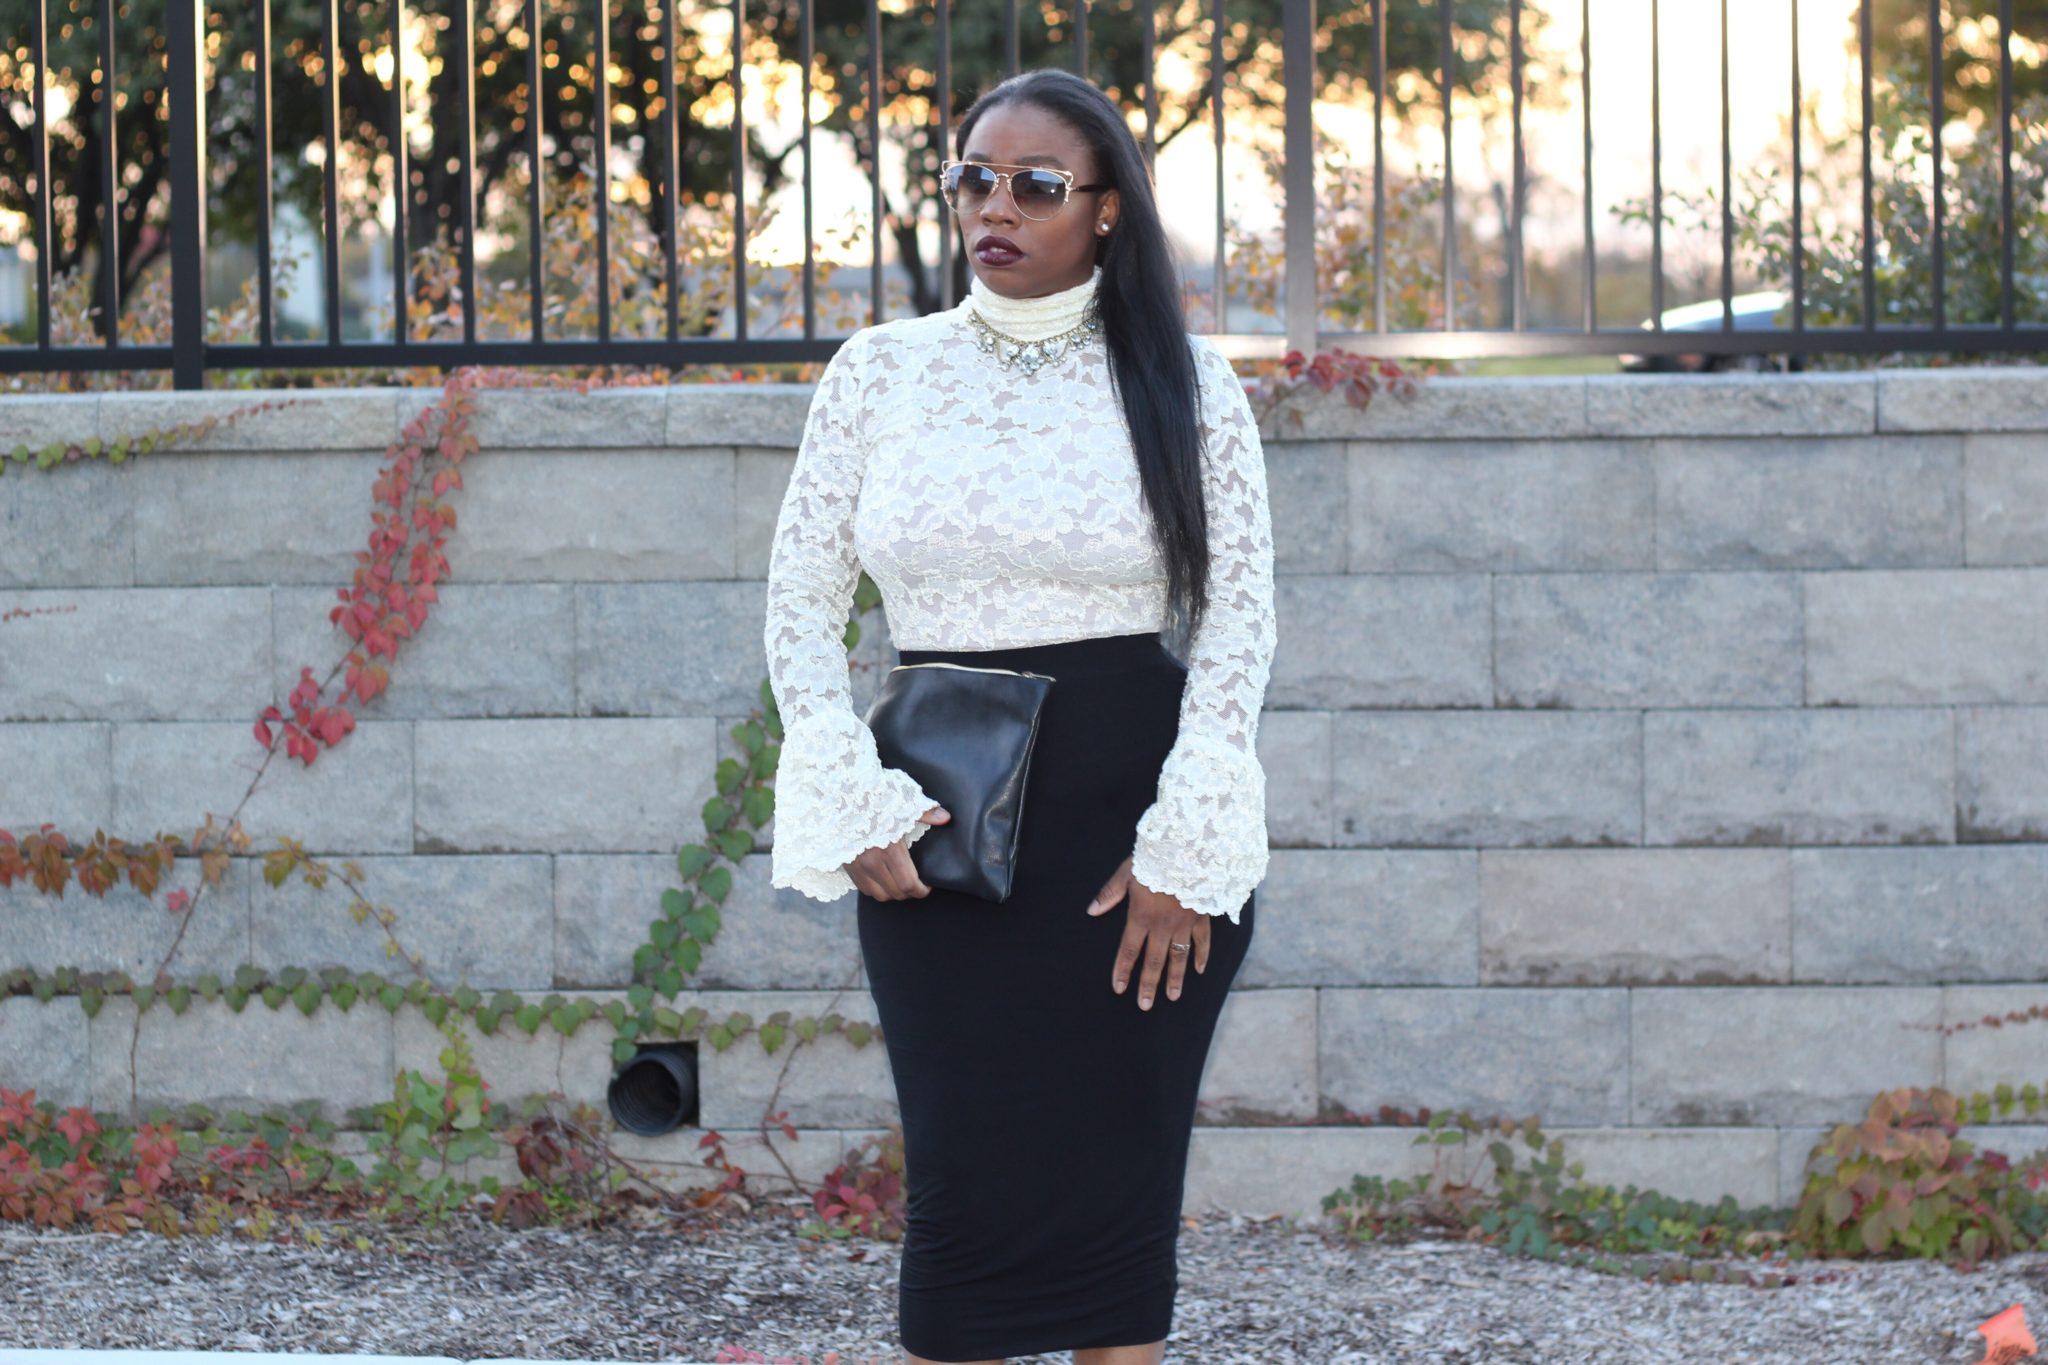 img_7732 Laced With StyleAmerican Apparel eBay Fall 2016 Fashion Fashion Nova Maybelline OOTD